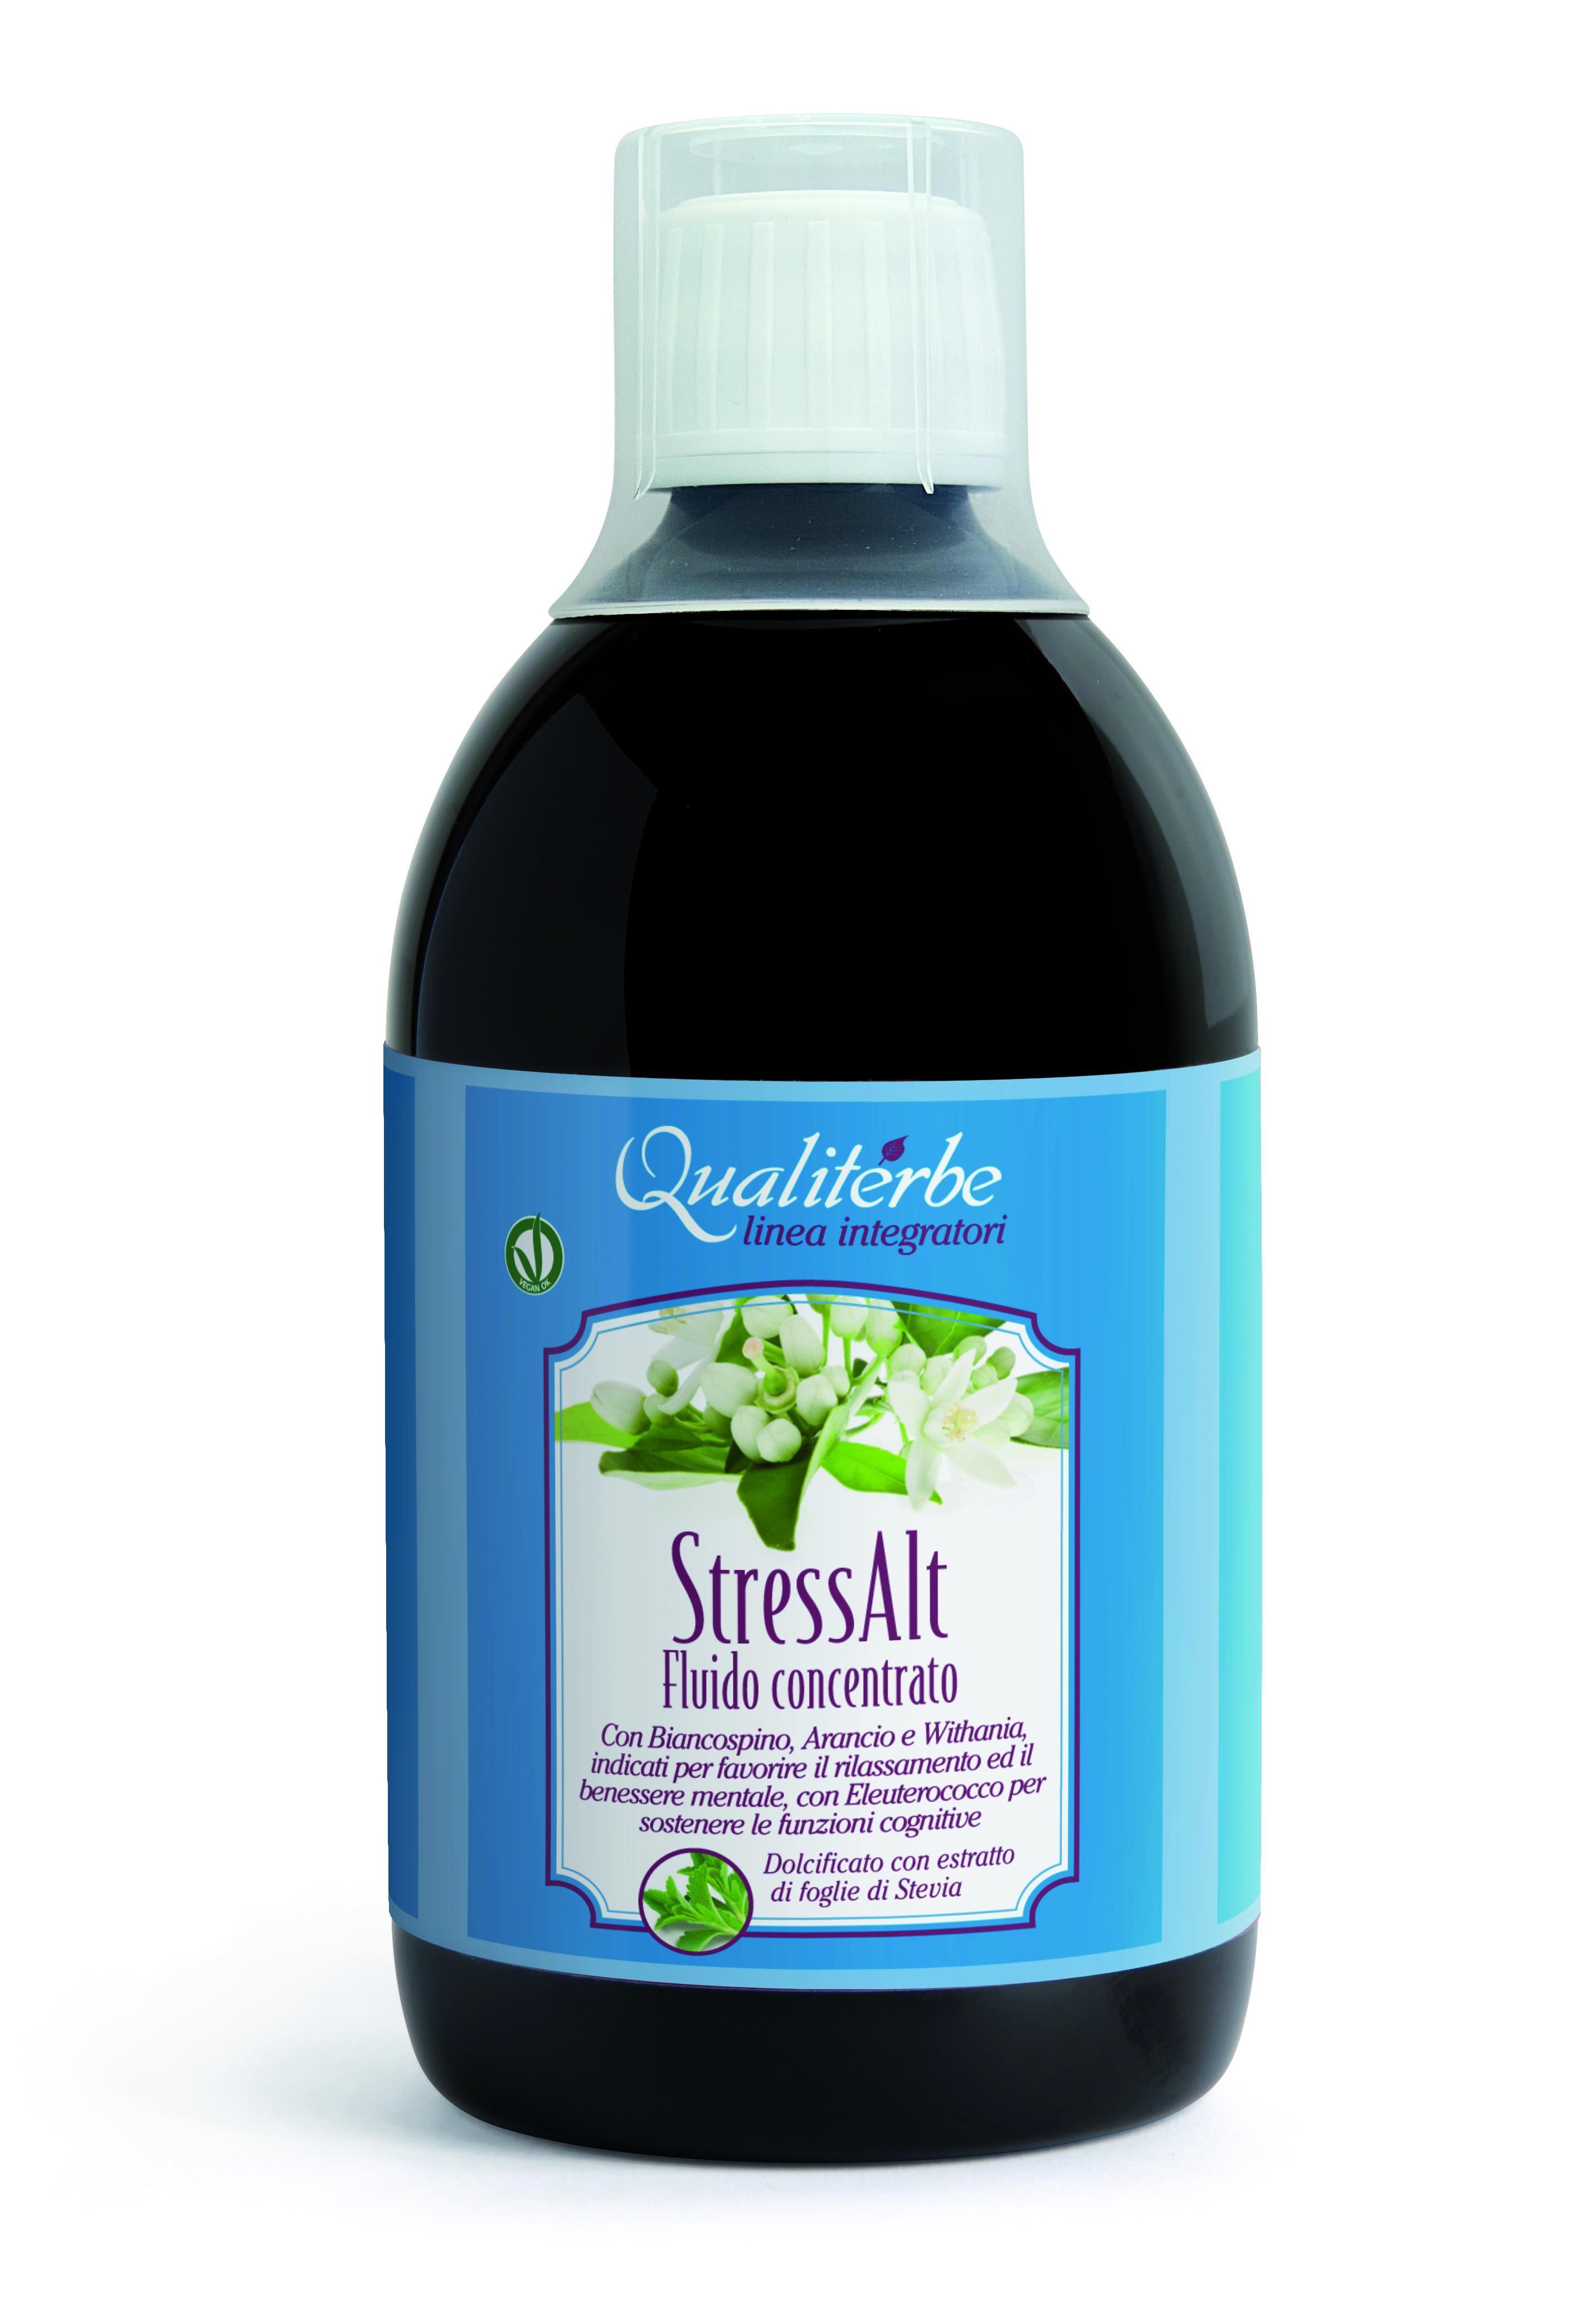 STRESS- ALT (VeganOk) antistress e antiossidante analcolico in Fluido concentrato 500 ml